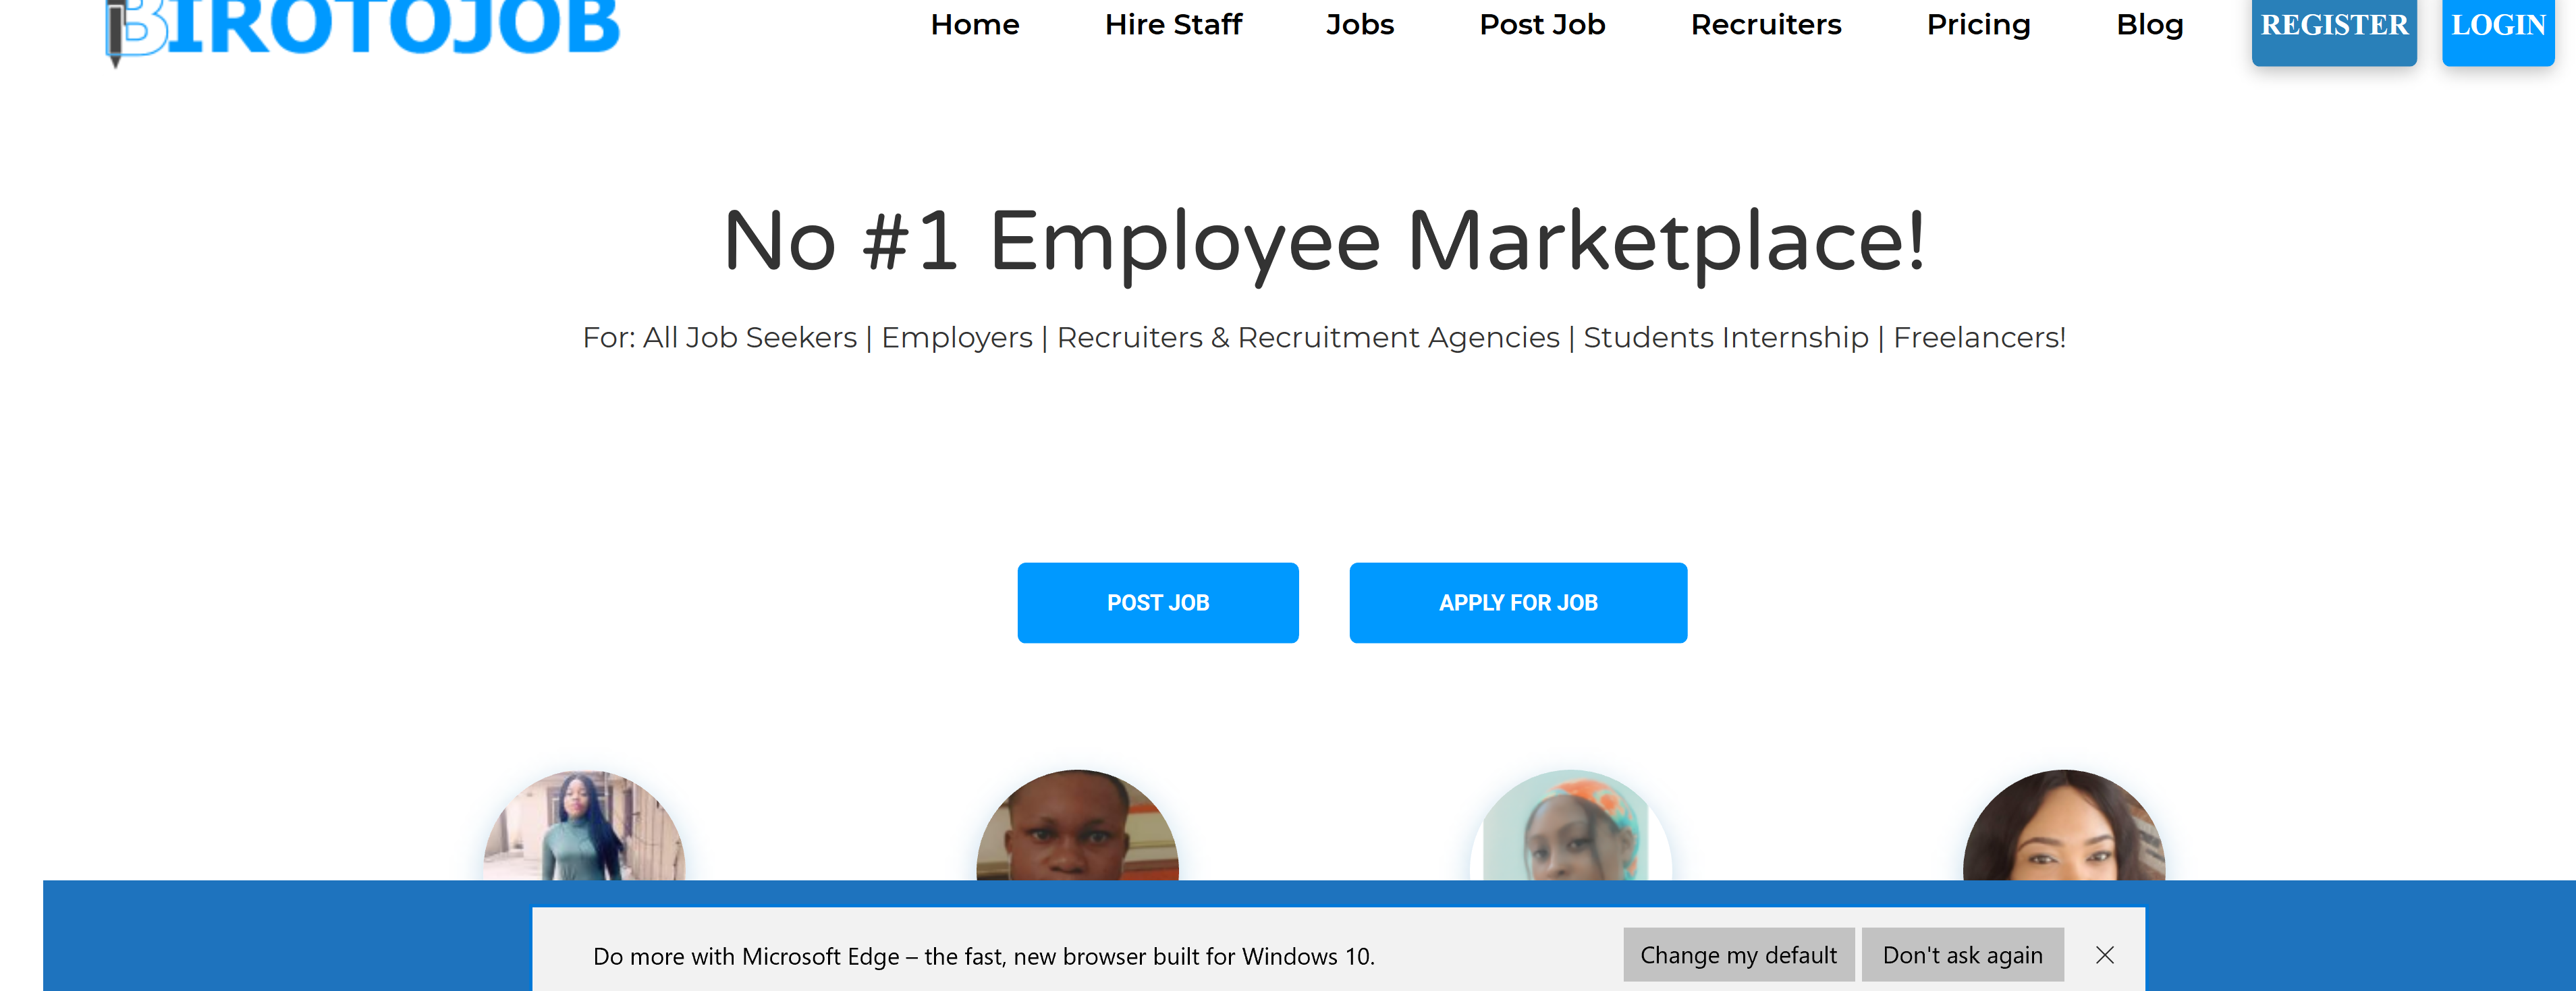 75 new job agencies in Lagos